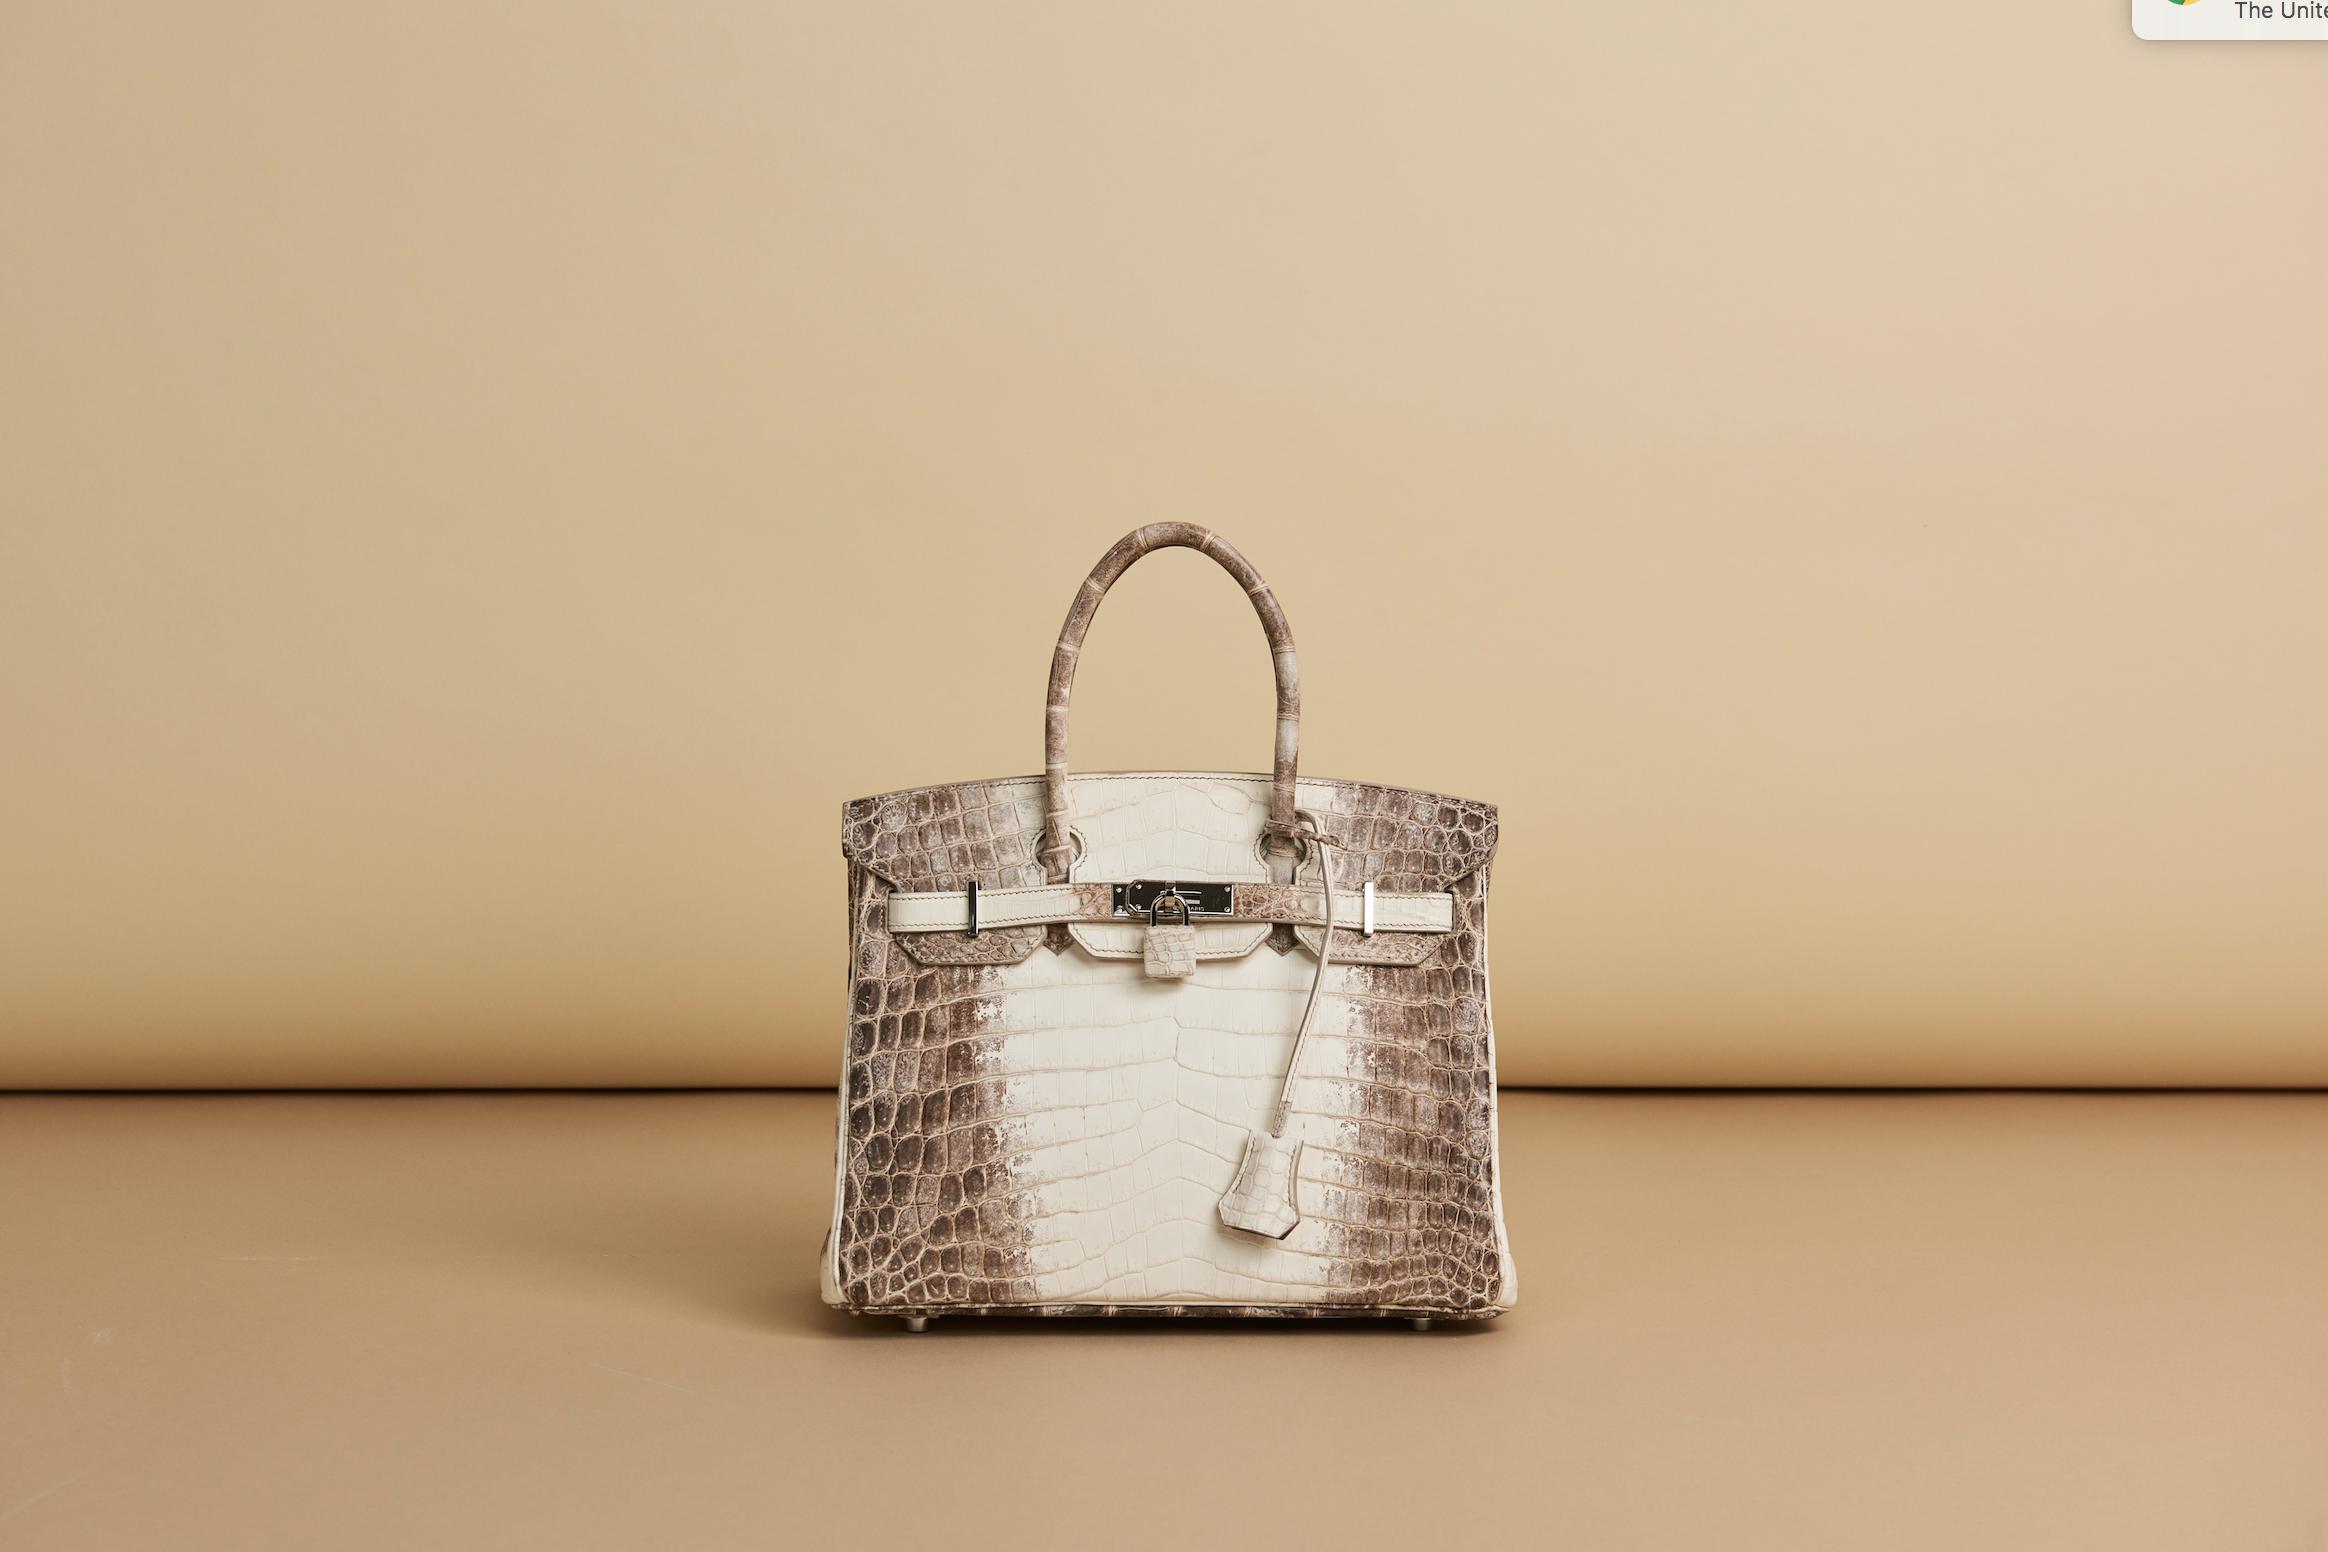 867b9ec819 The resale luxury handbag market is booming